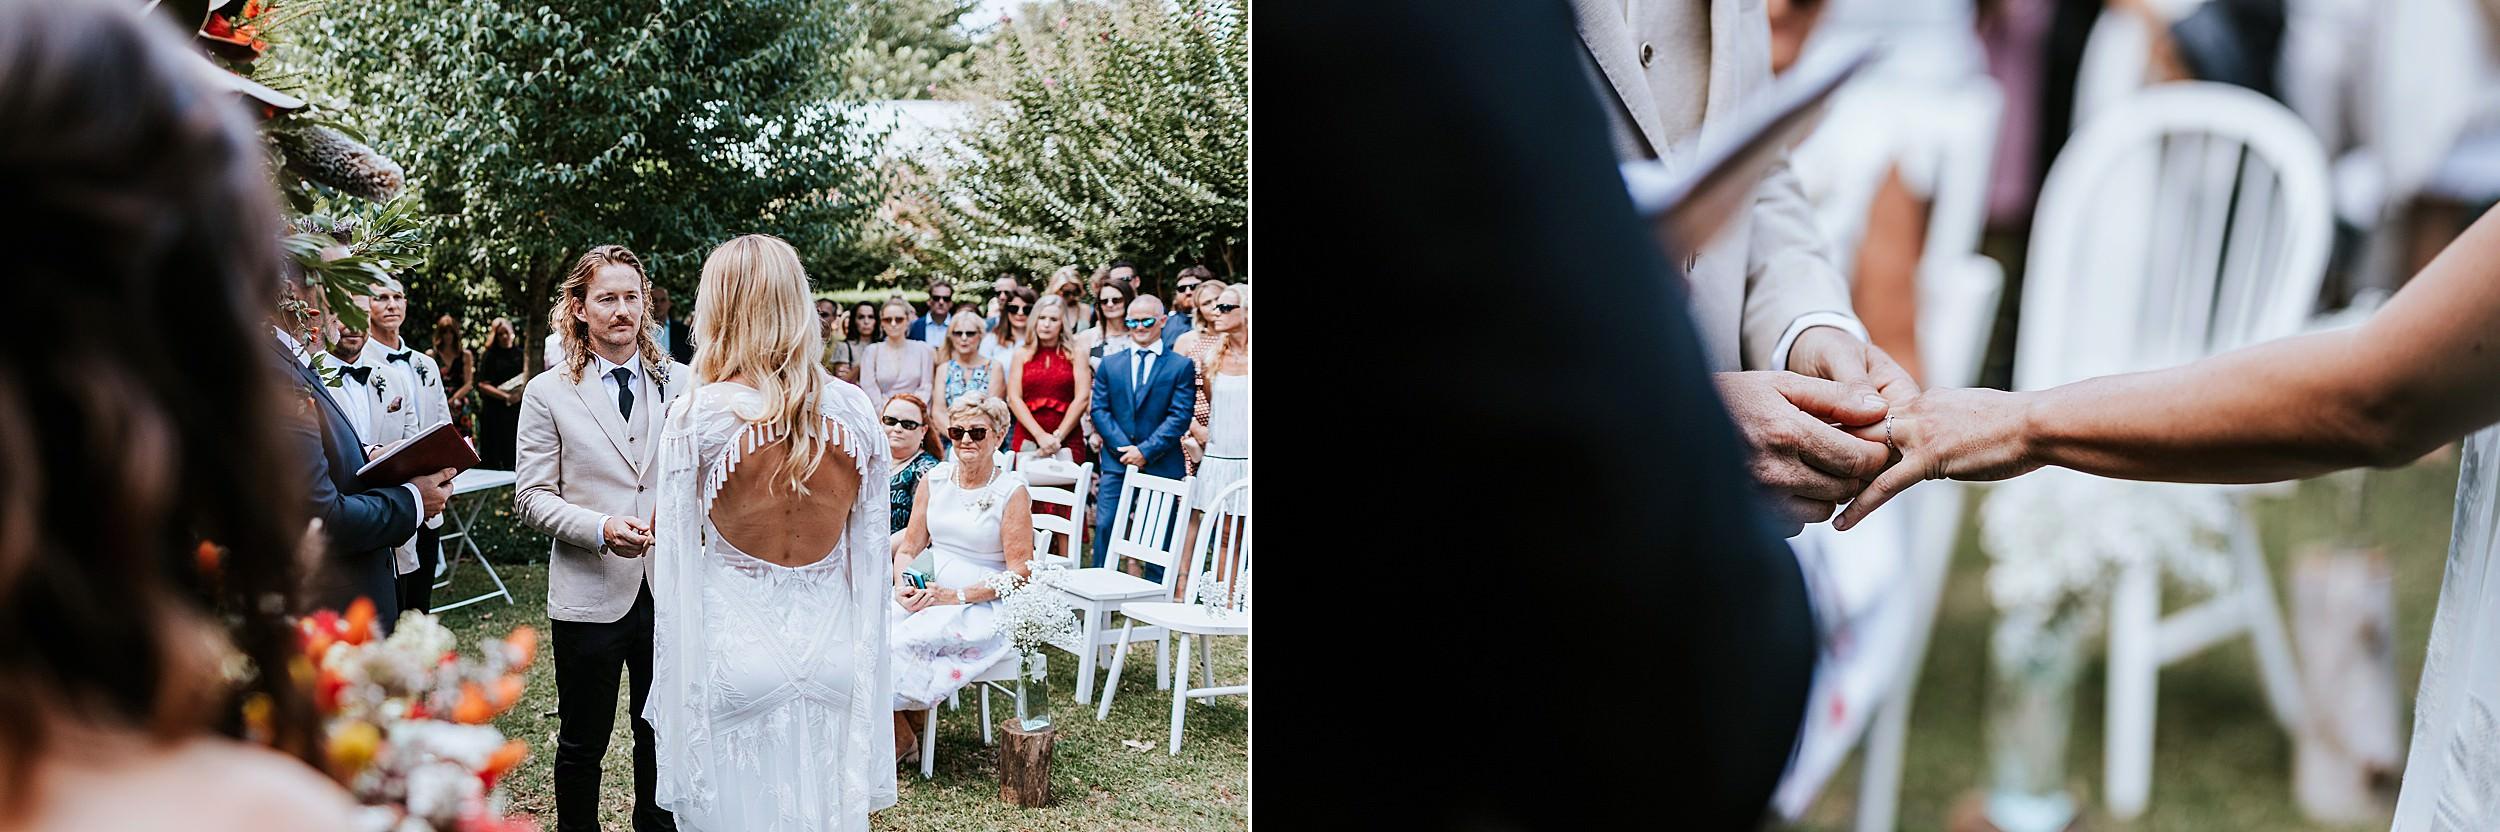 wedding_the_woolshed_steph_zac_0102.jpg